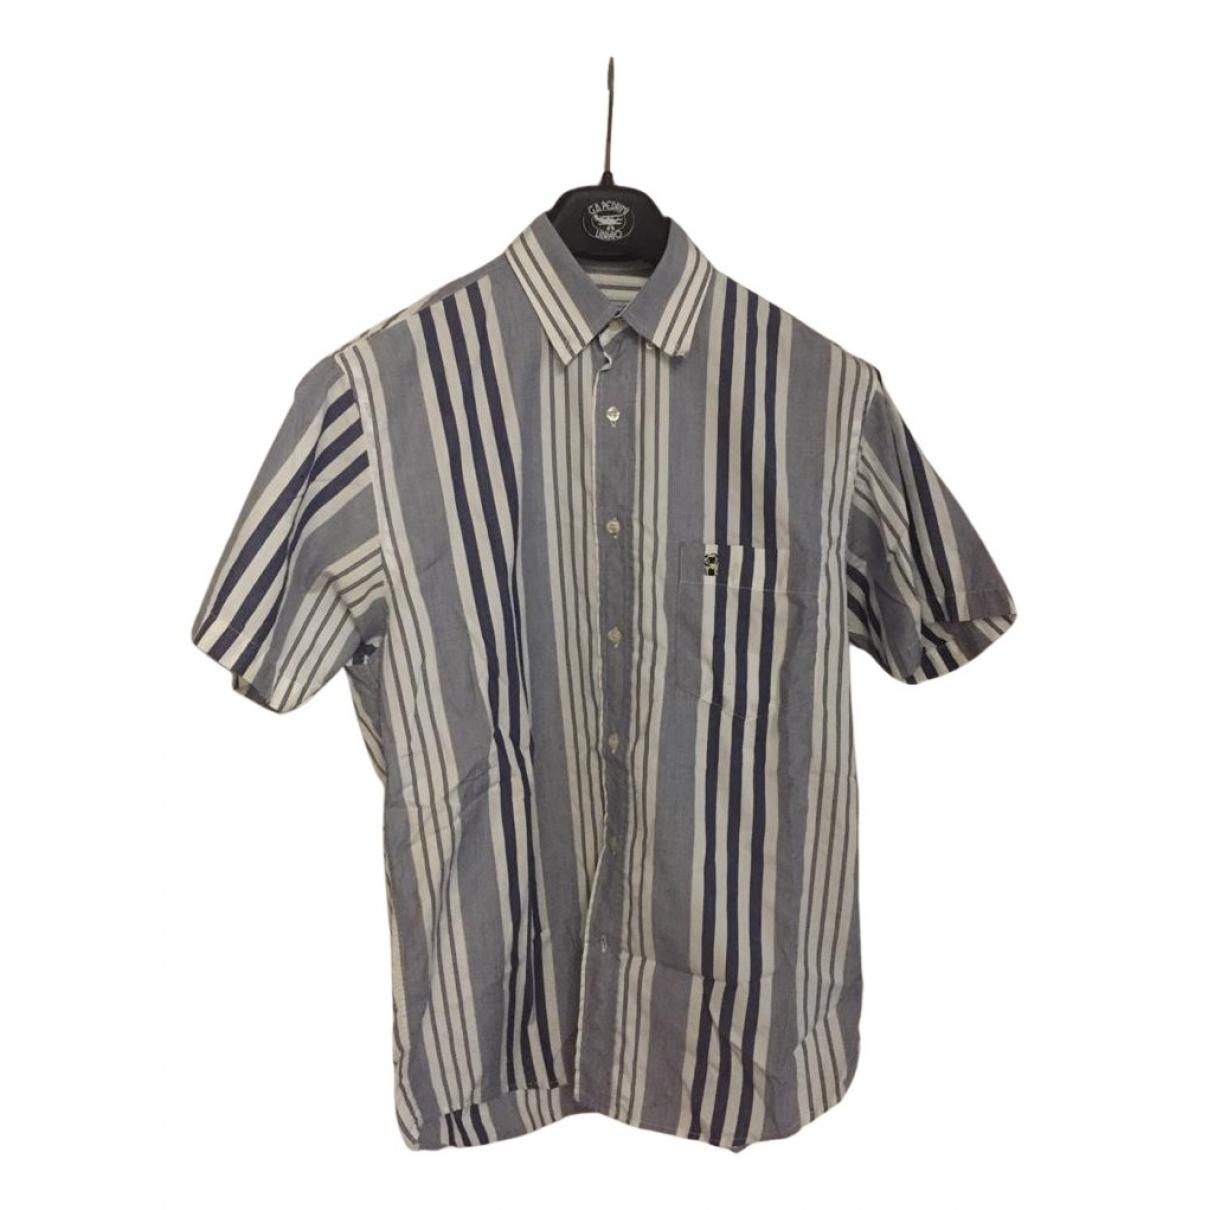 Valentino Garavani N Blue Cotton Shirts for Men 39 EU (tour de cou / collar)